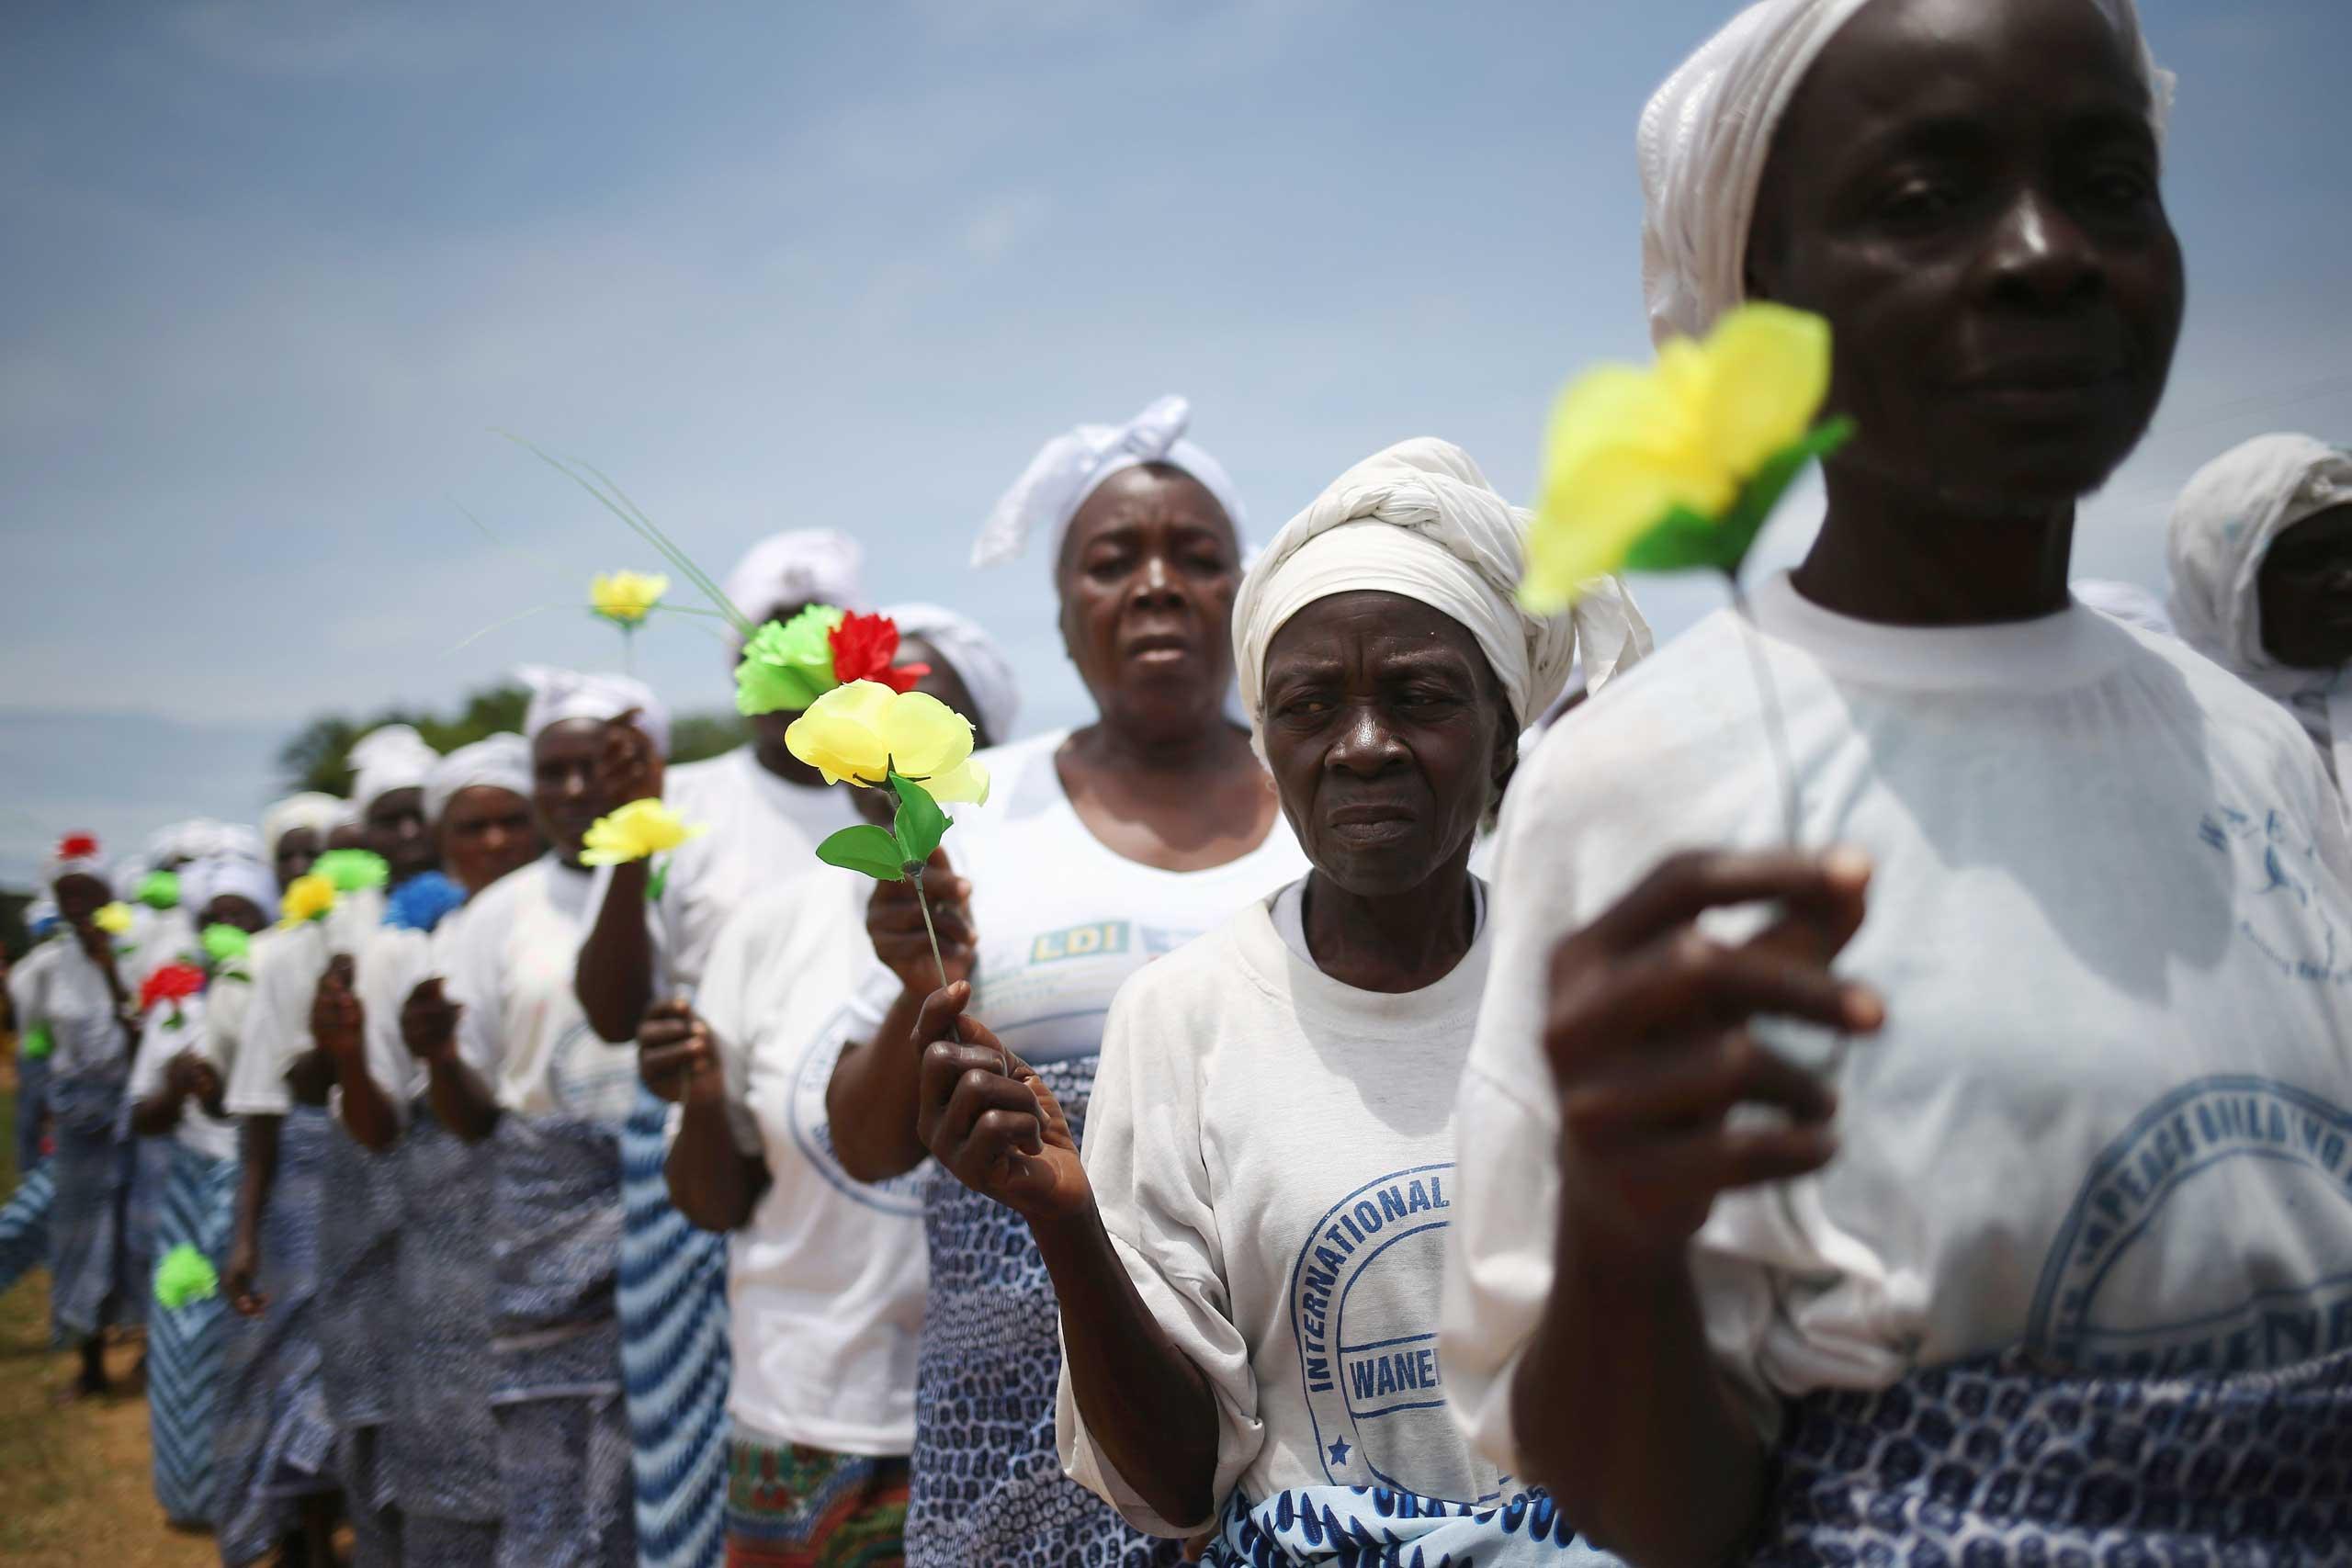 Women pray for an end of the Ebola epidemic on Aug. 14, 2014 in Monrovia, Liberia.